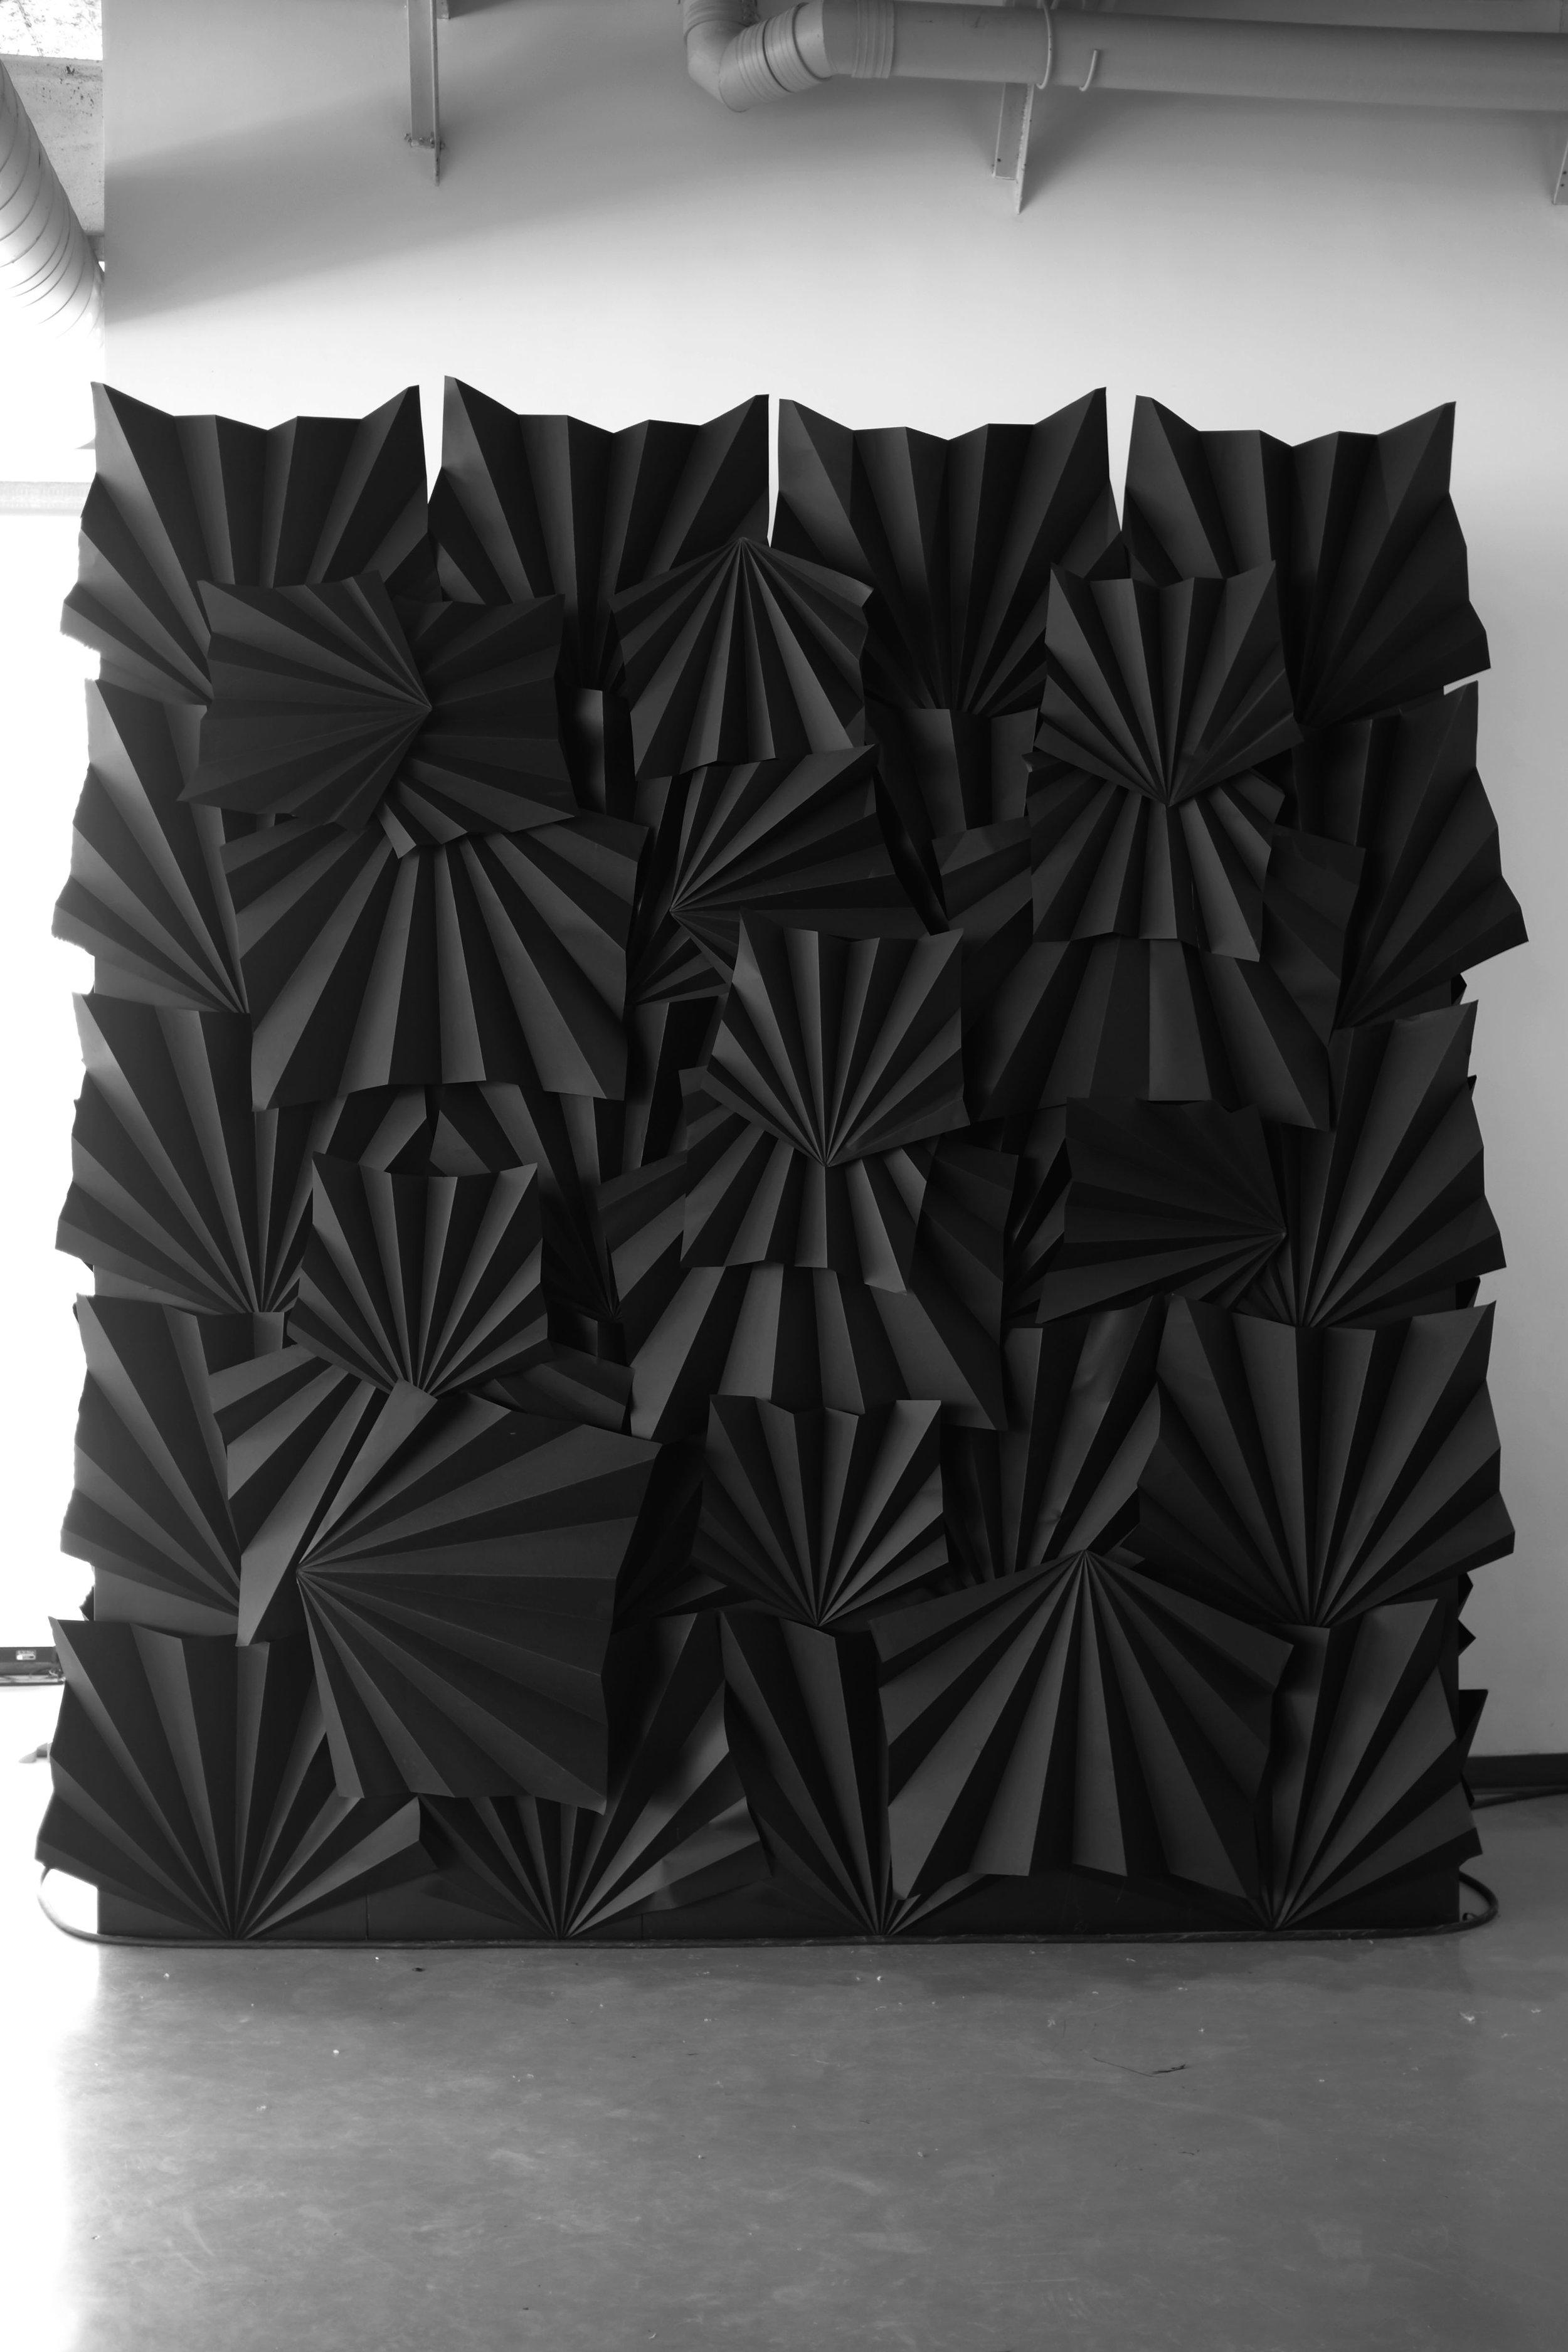 miss-cloudy-pauline-loctin-paper-art-folding-origami-installation-murale-black-wall.jpg